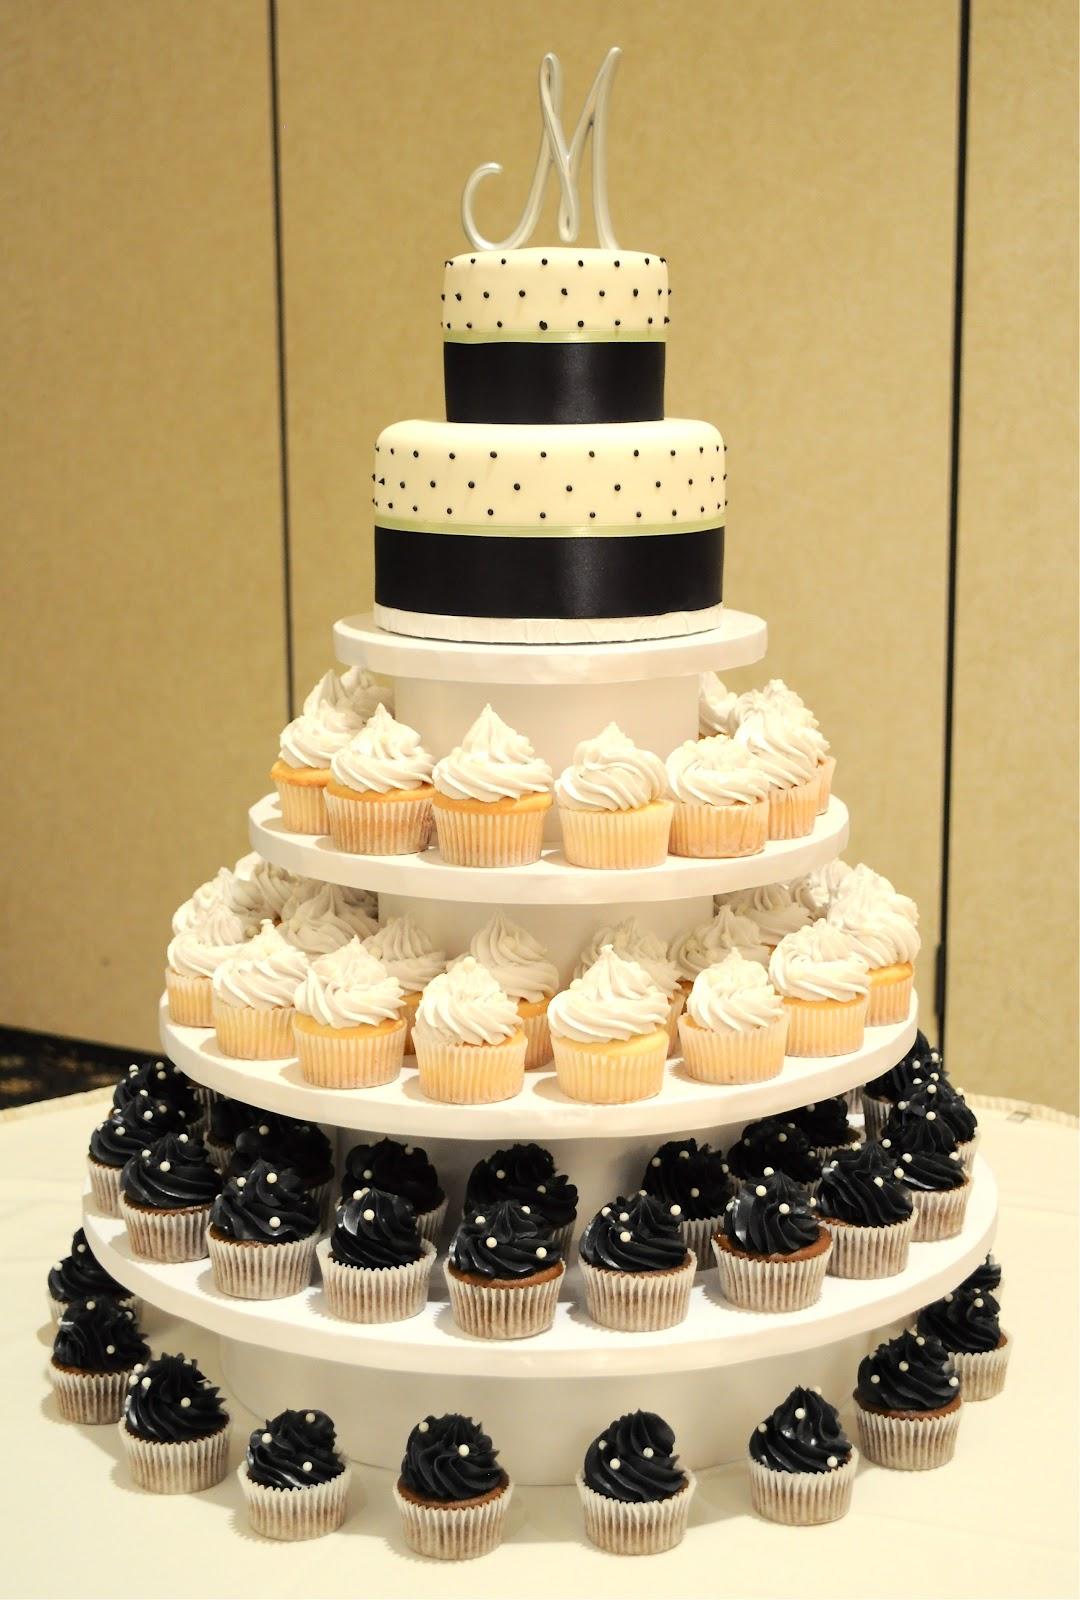 12 Wedding Cake With Cupcakes Around It Photo - Wedding Cakes with ...